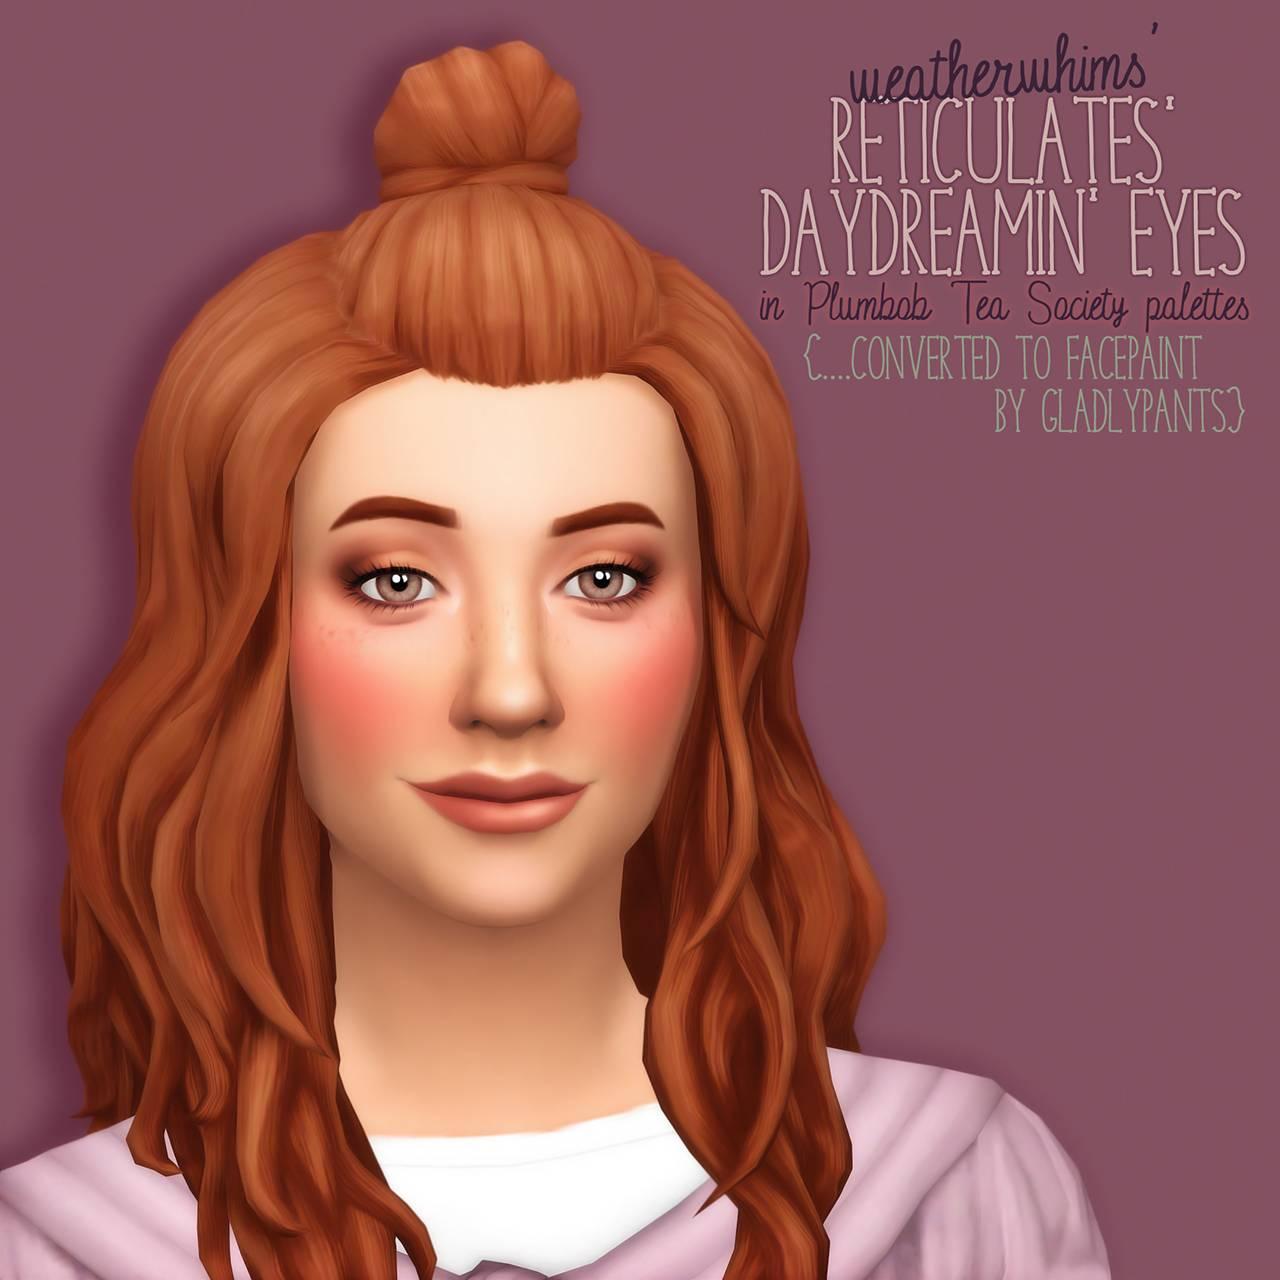 Линзы - Weatherwhims Reticulates Daydreamin Eyes